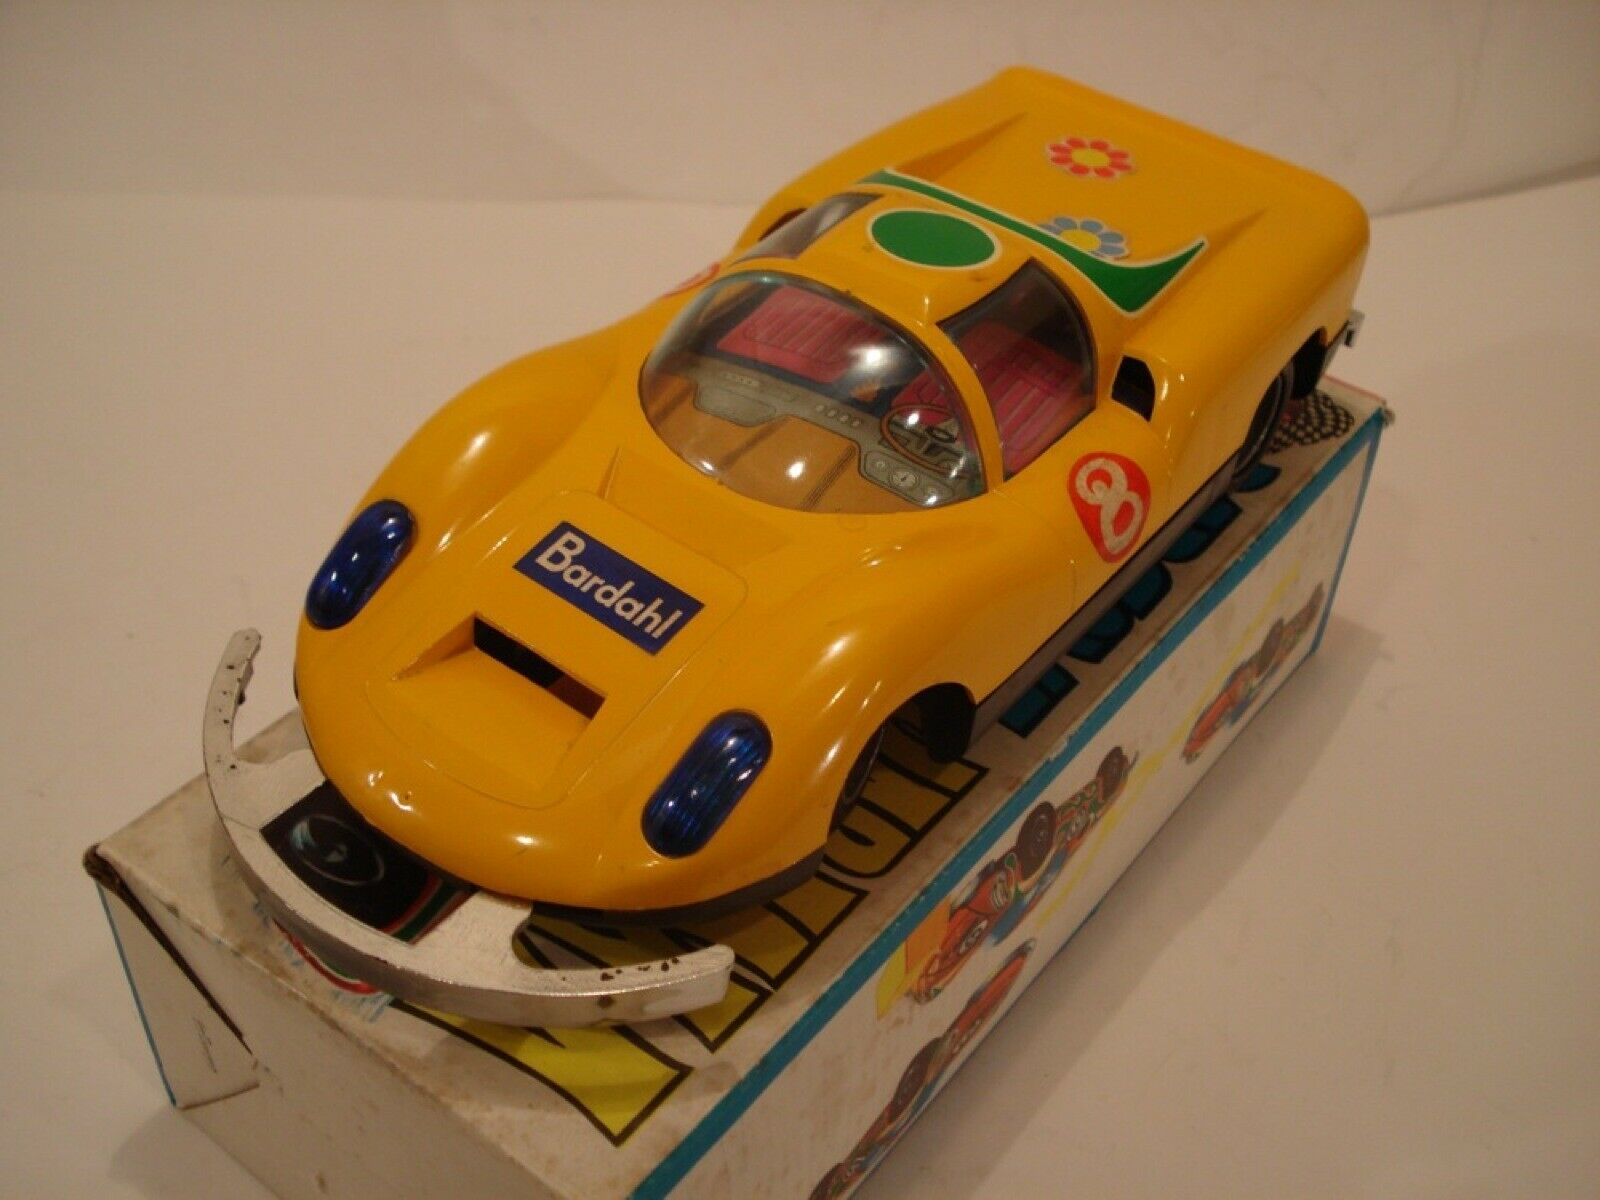 JYE (Spain) Porsche  910 Bardahl Battery-Operated NIB  produit de qualité